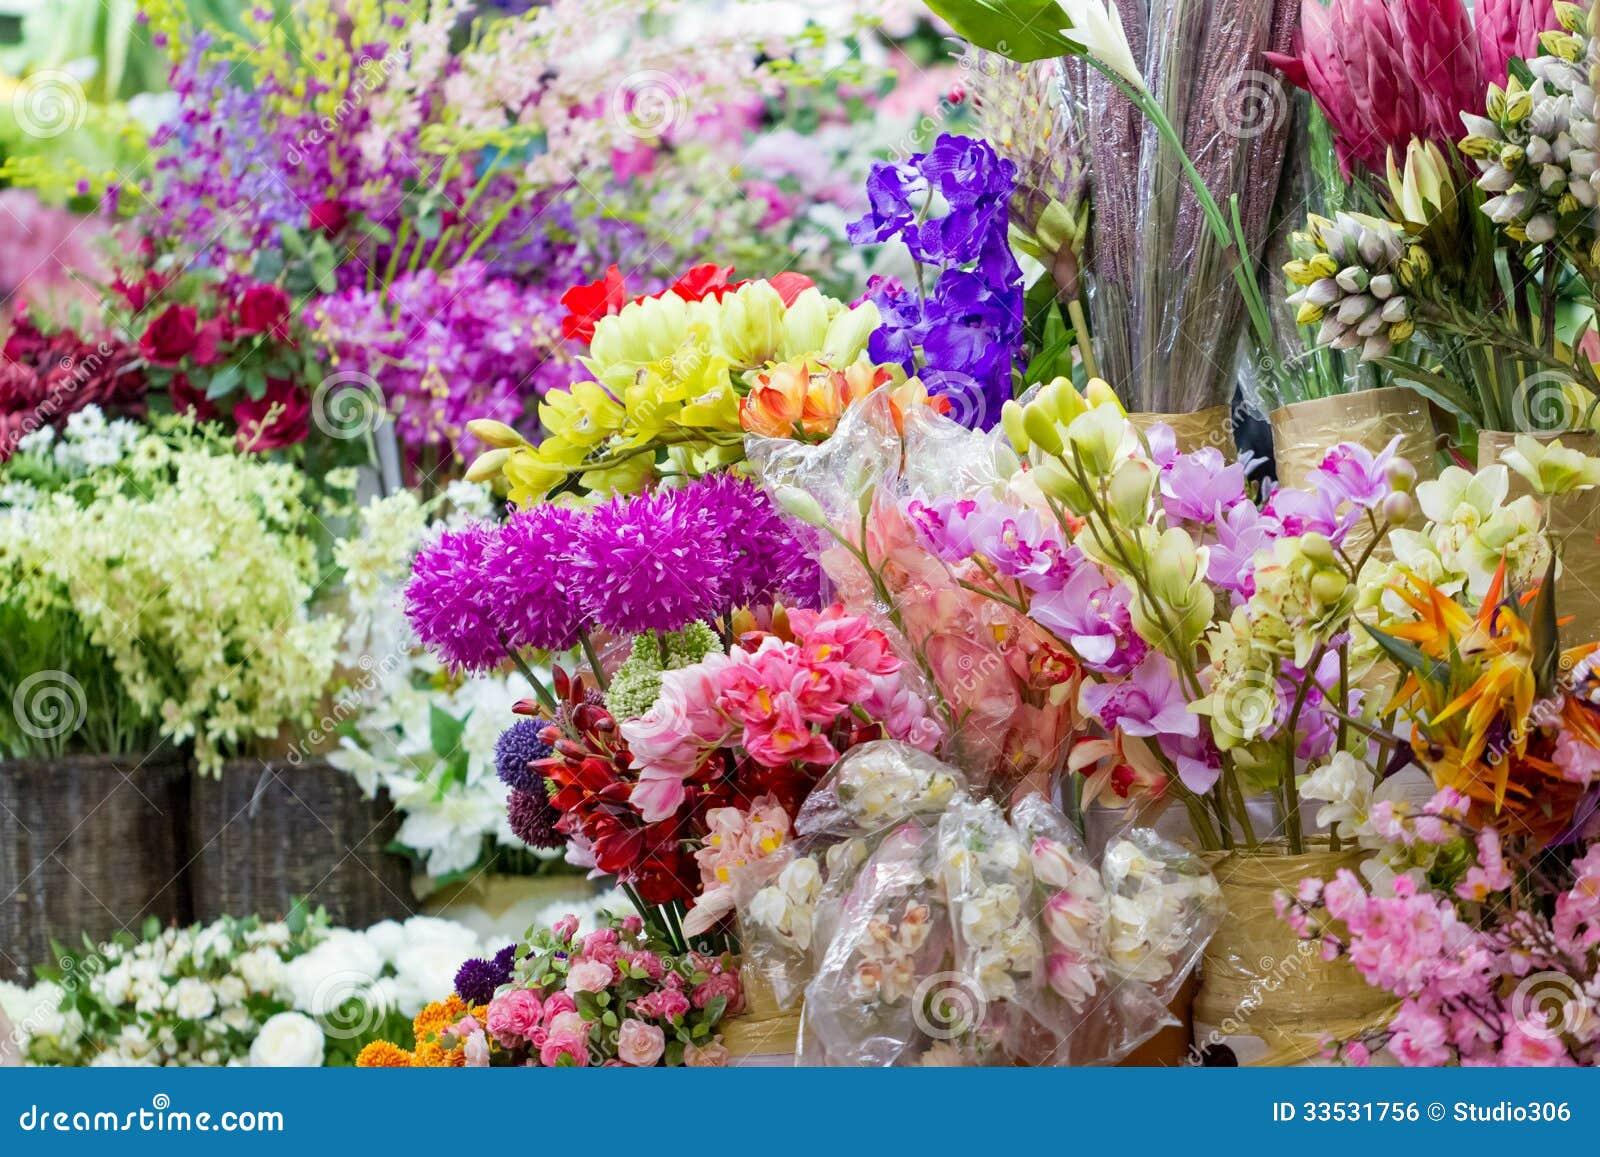 artificial flowers market royalty free stock image image 33531756. Black Bedroom Furniture Sets. Home Design Ideas